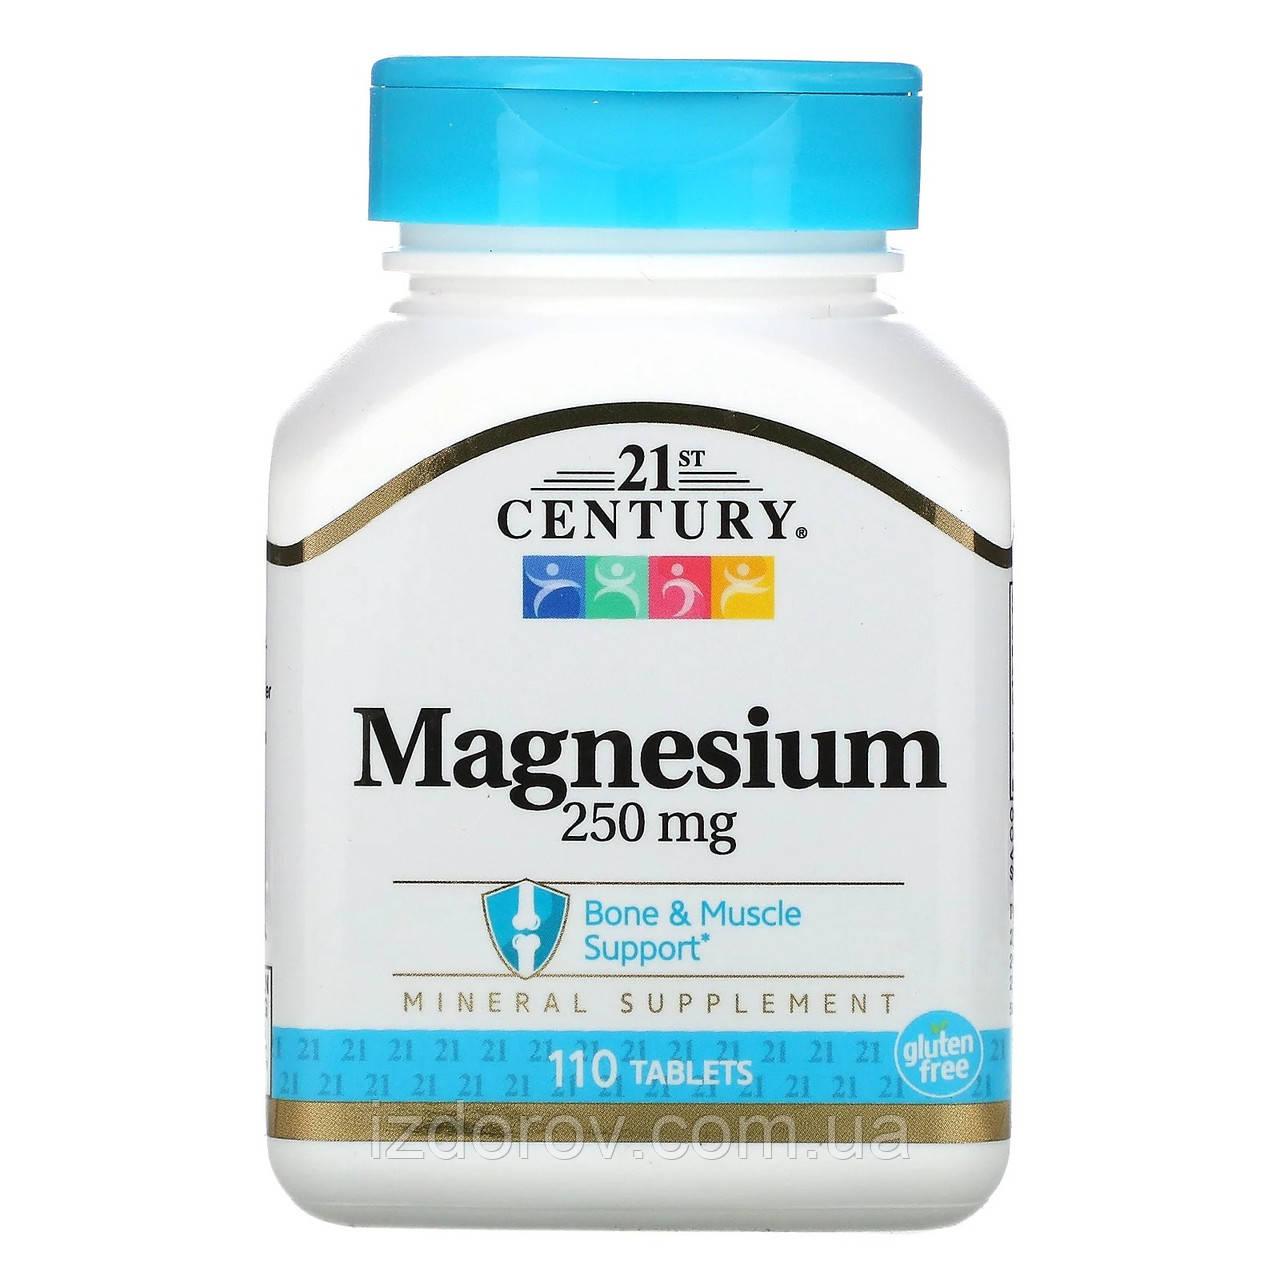 21st Century, Магний, 250 мг, Magnesium, 110 таблеток